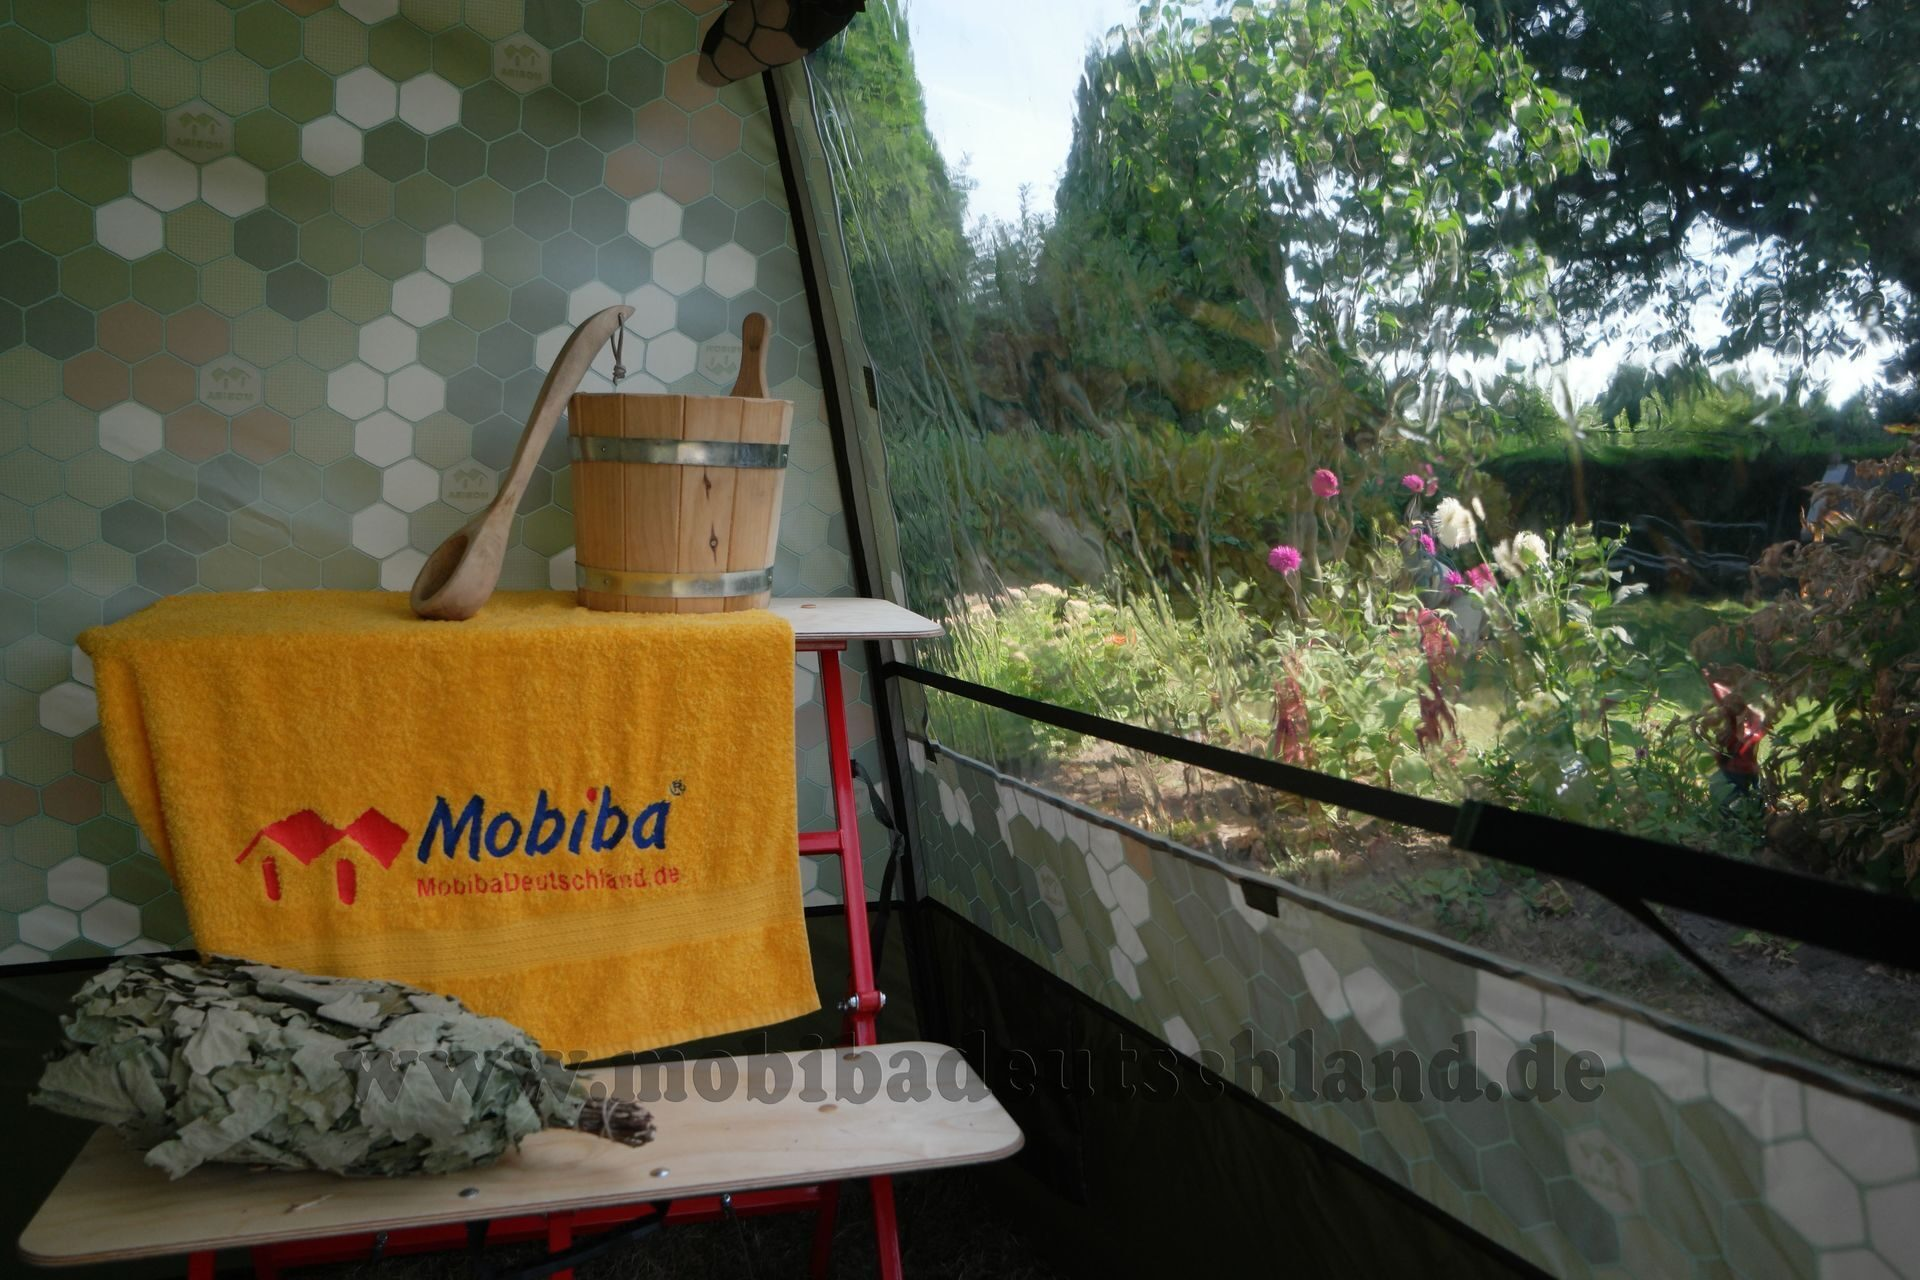 mobile sauna mb 10 aquarium 1 fenster preis bilder. Black Bedroom Furniture Sets. Home Design Ideas